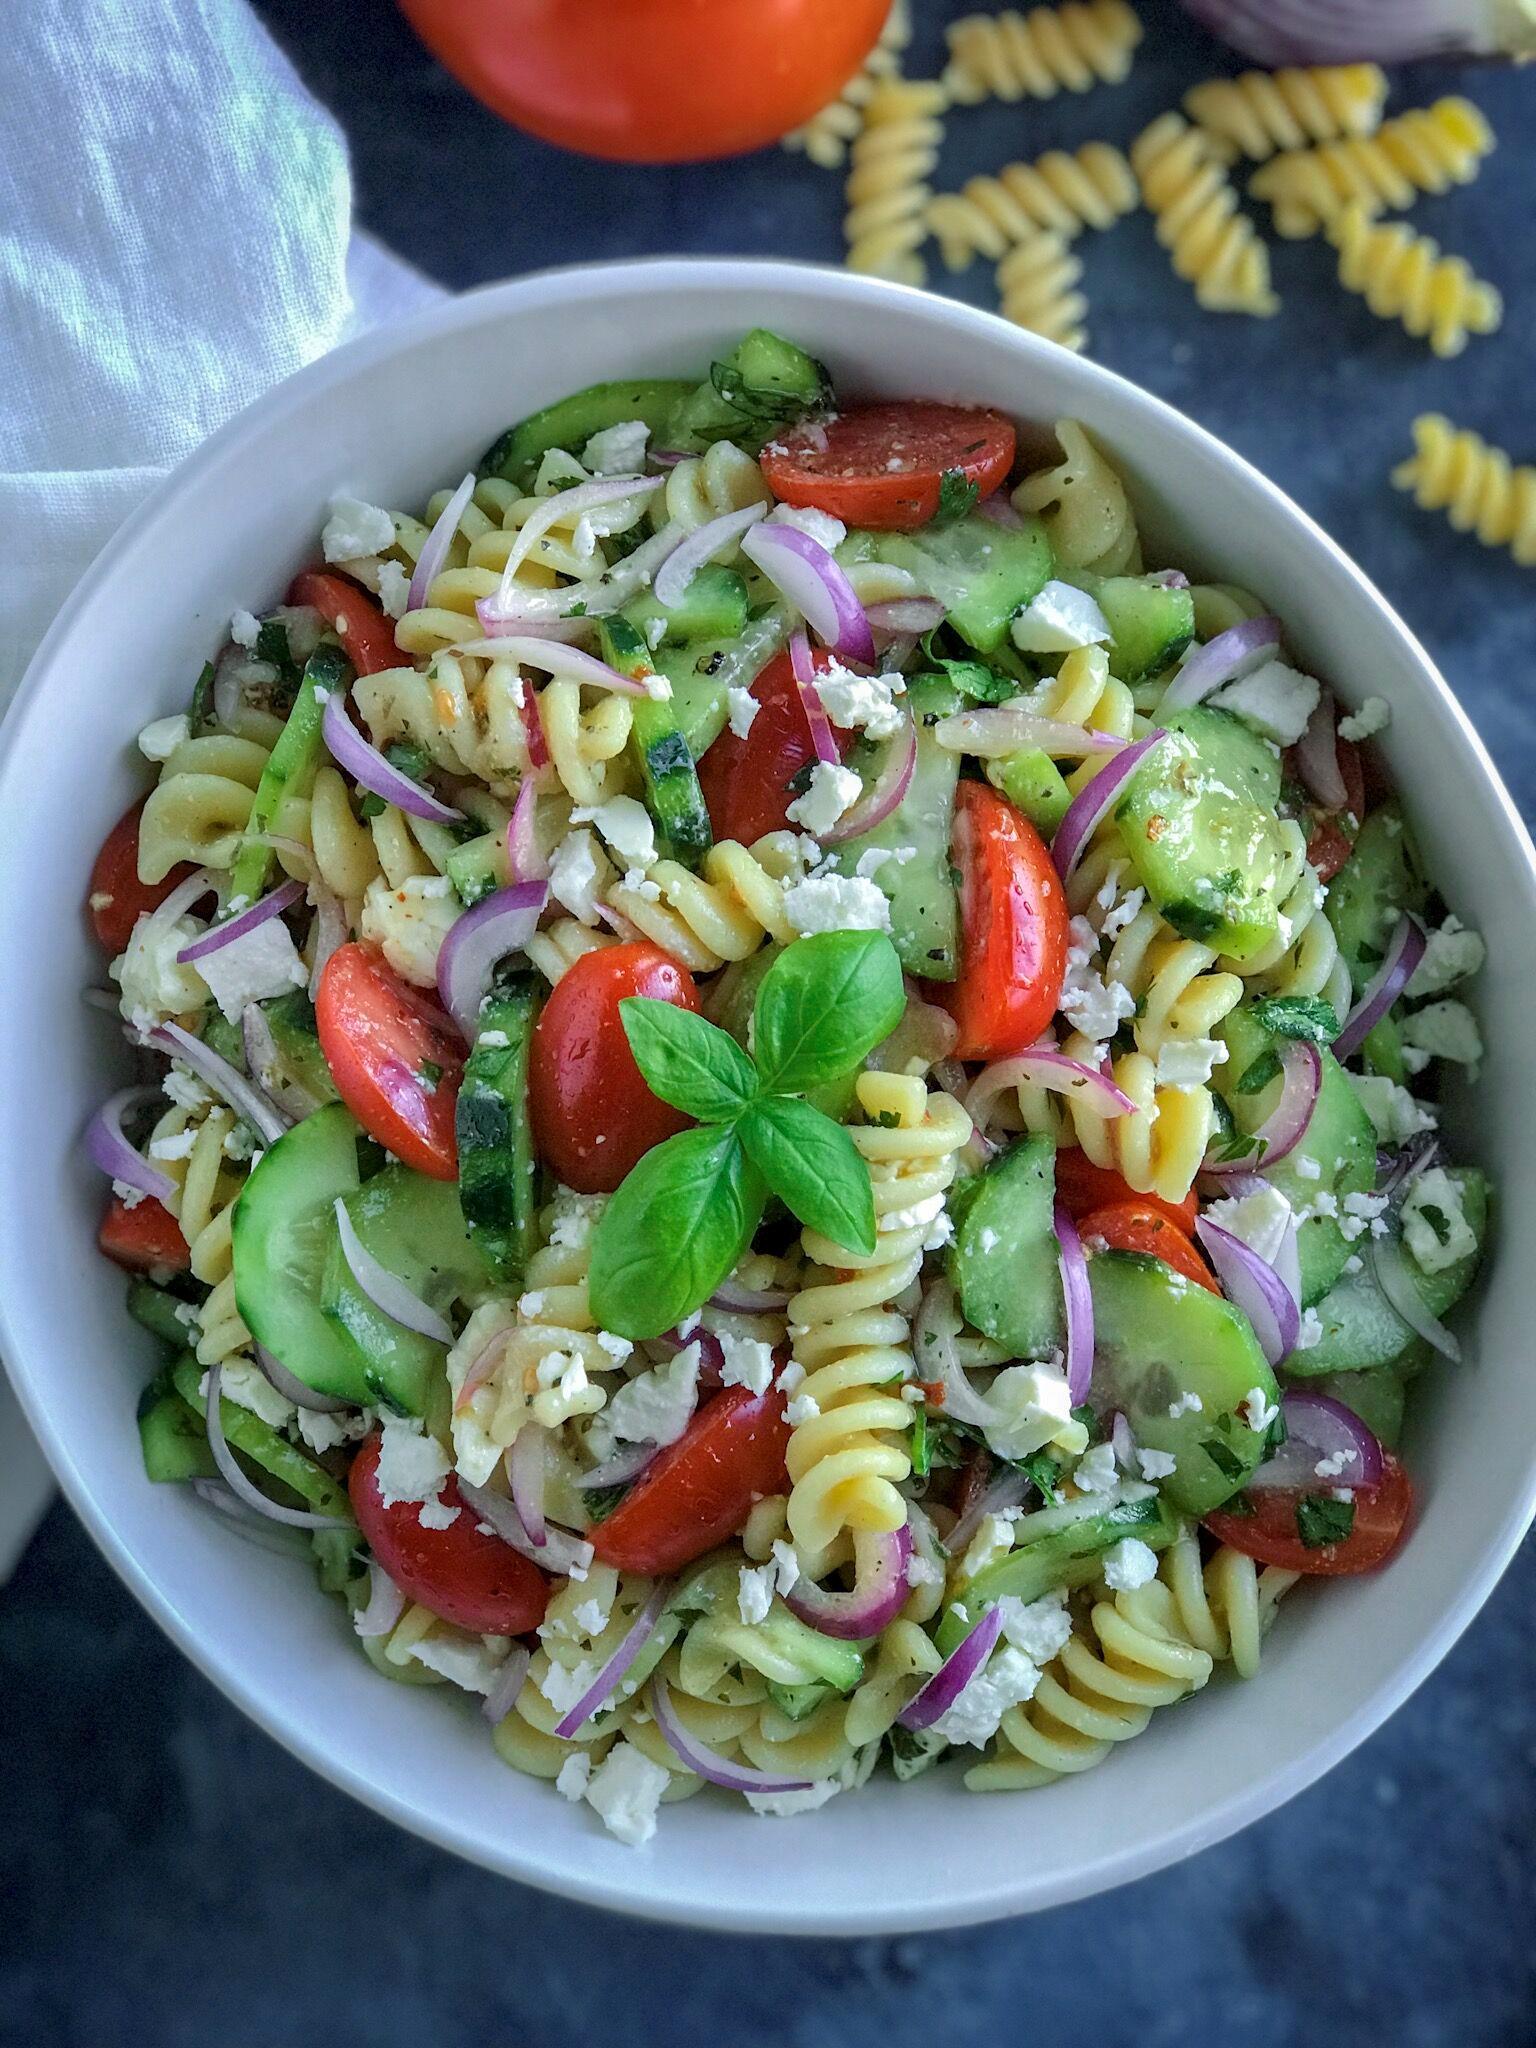 Greek Pasta Salad with lemon vinaigrette